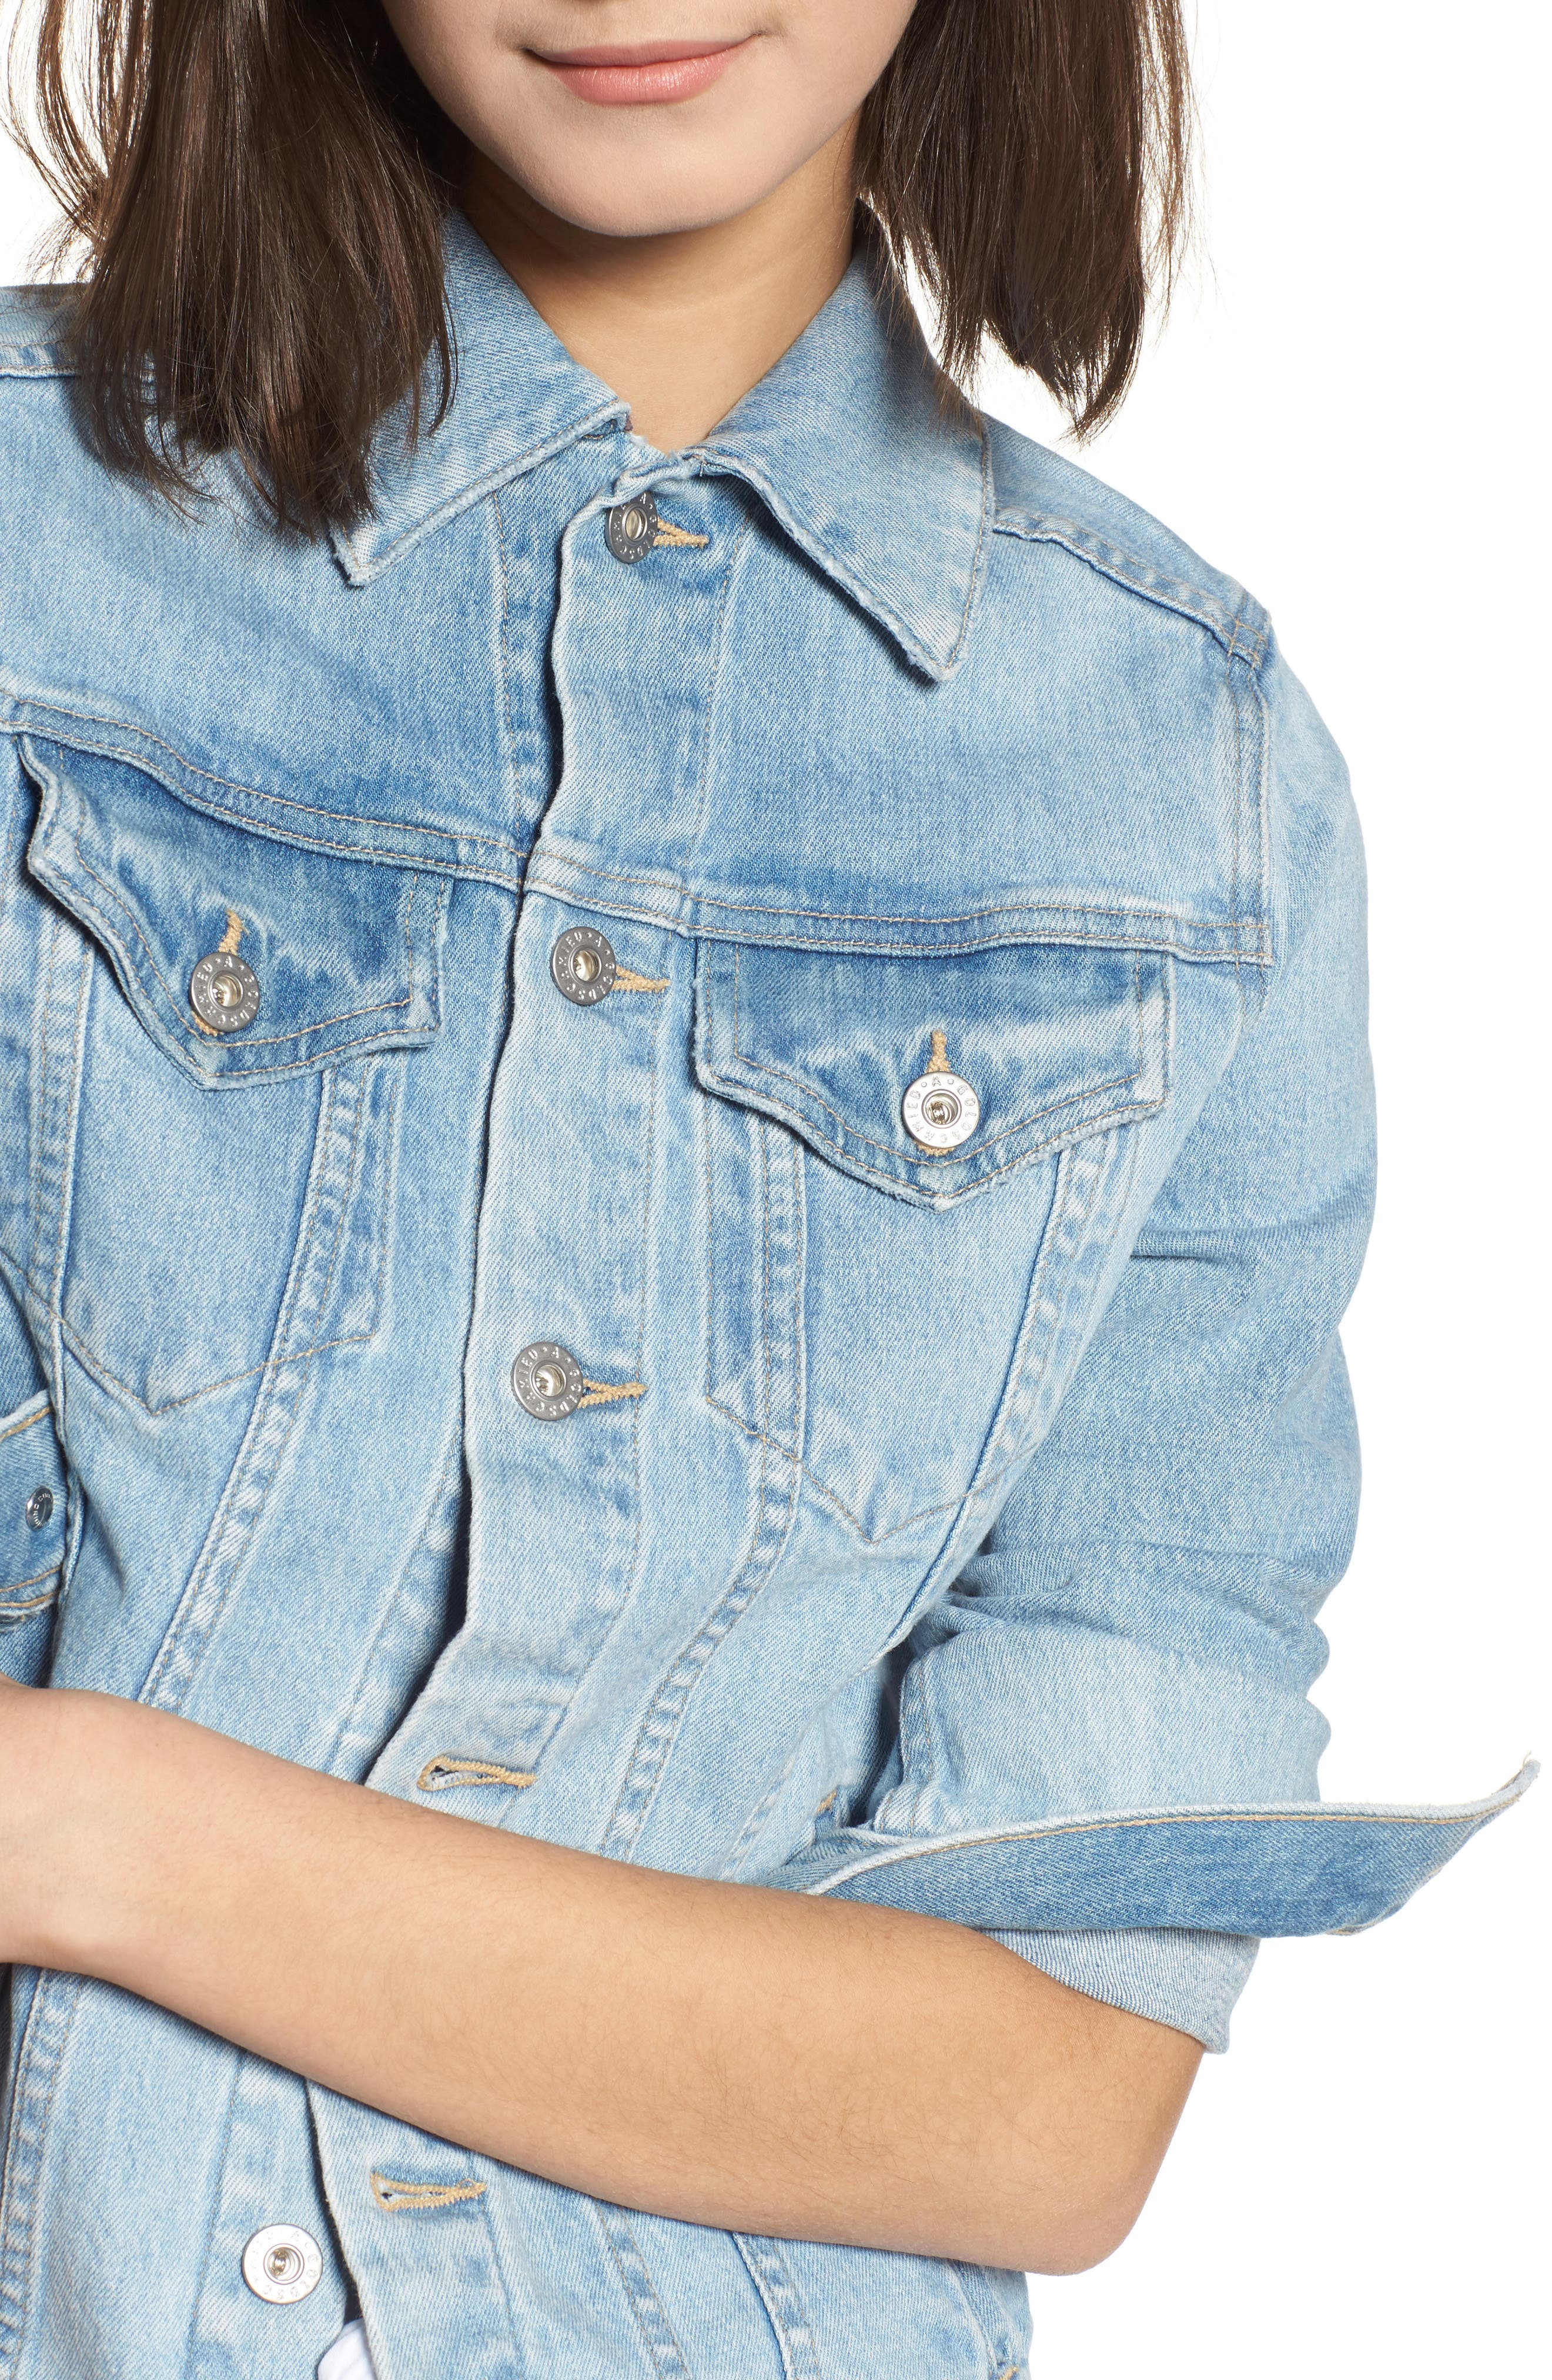 Mya Denim Jacket,                             Alternate thumbnail 4, color,                             SUNLIGHT BLUE